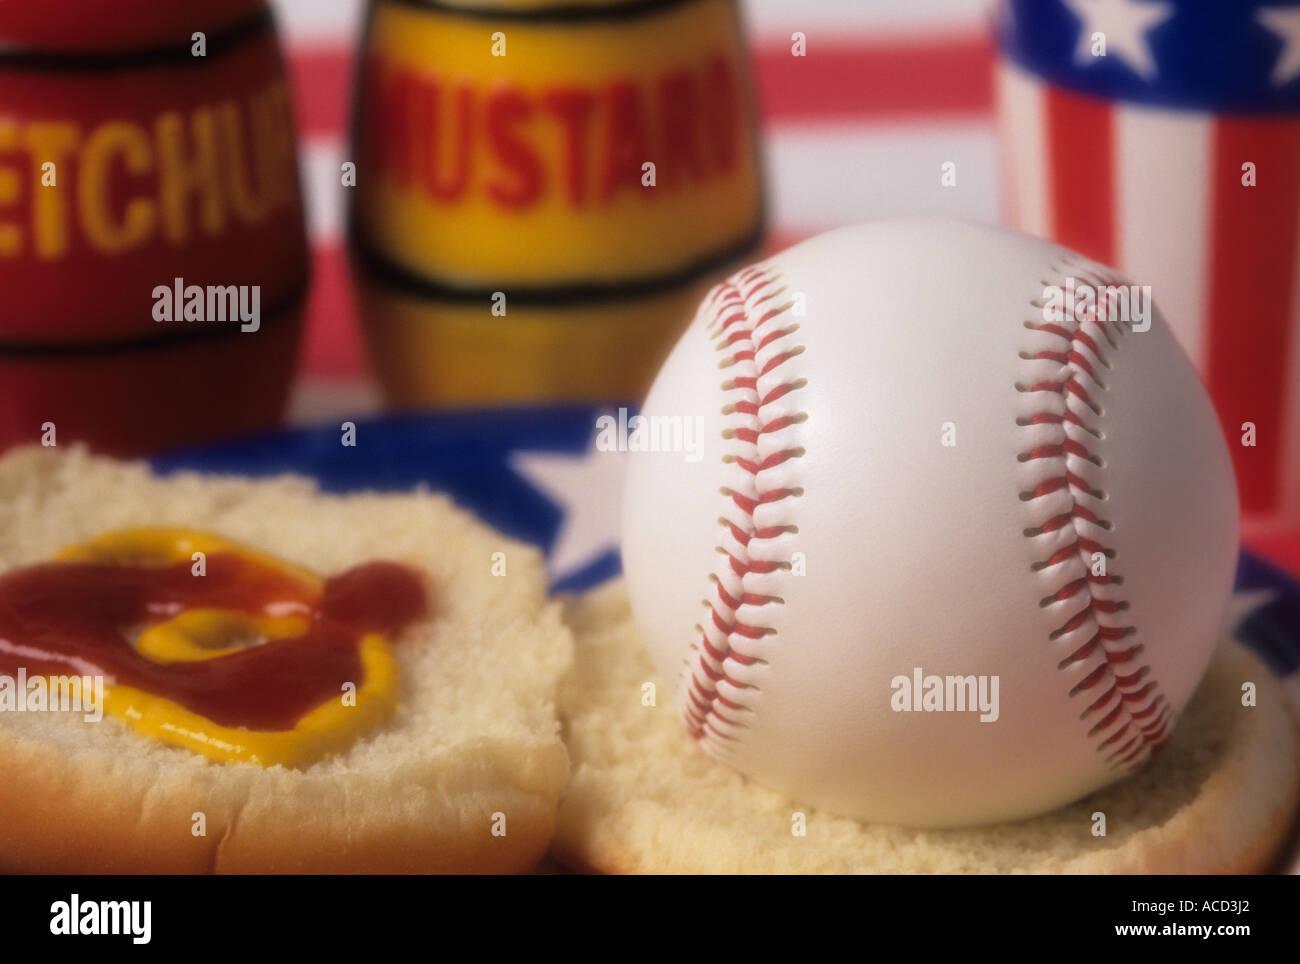 Baseball sitting on hamburger bun open faced with ketchup and mustard on bun Issaquah Washington State USA - Stock Image